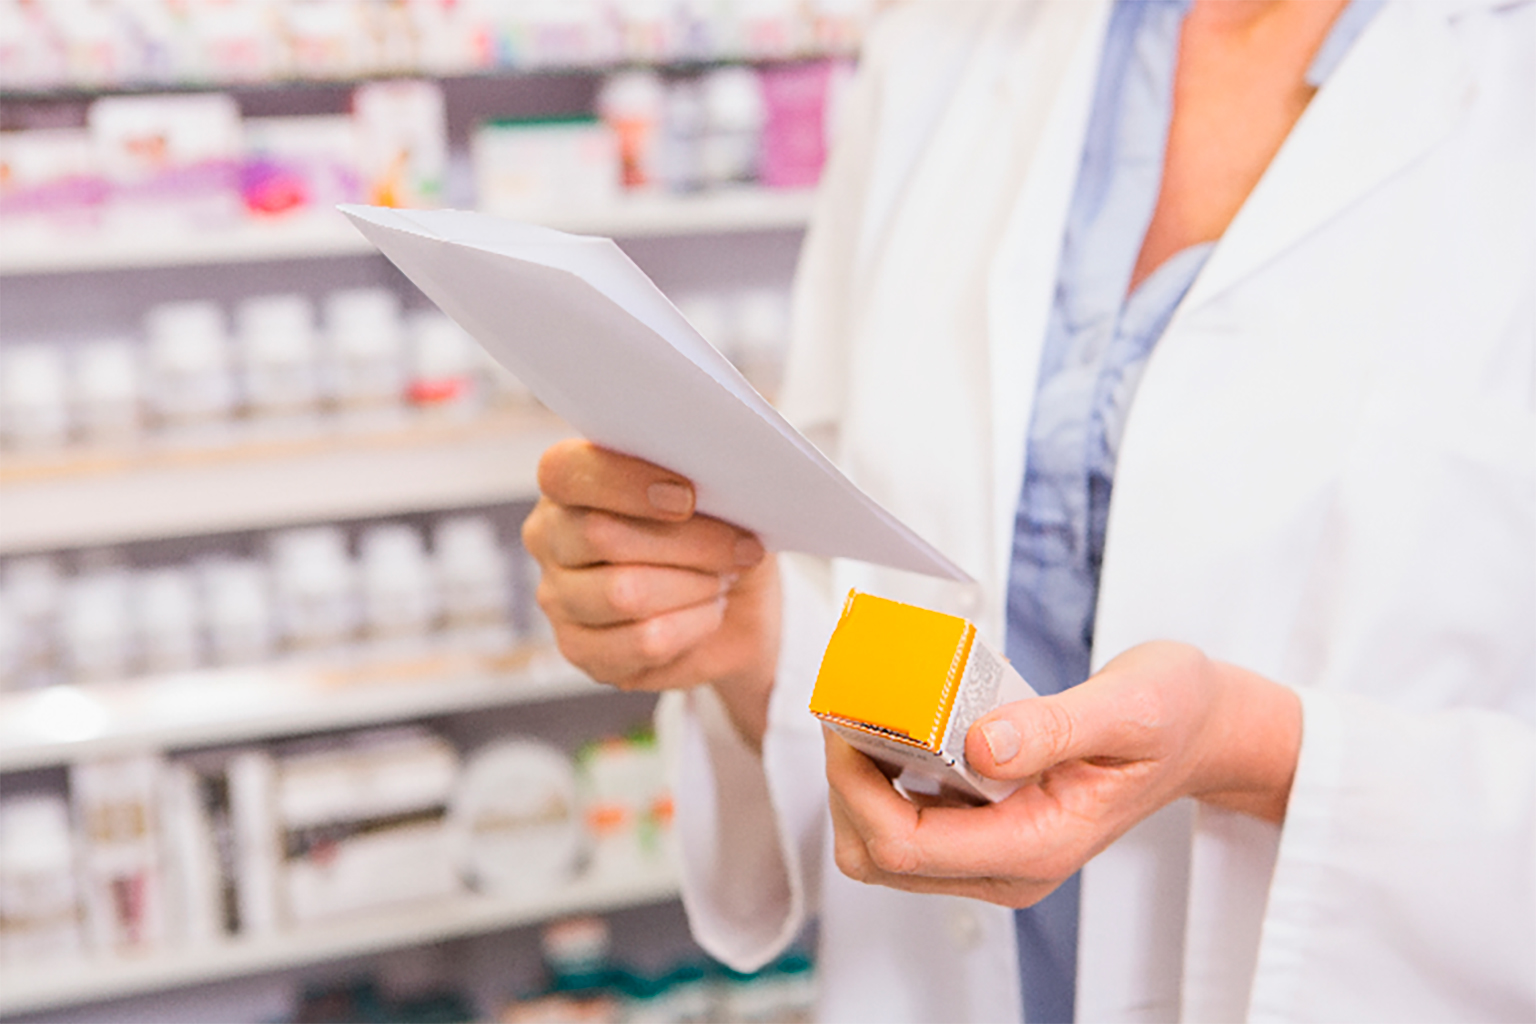 dcoupon estará presente en más de 9300 farmacias de España tras cerrar un acuerdo con FEFE